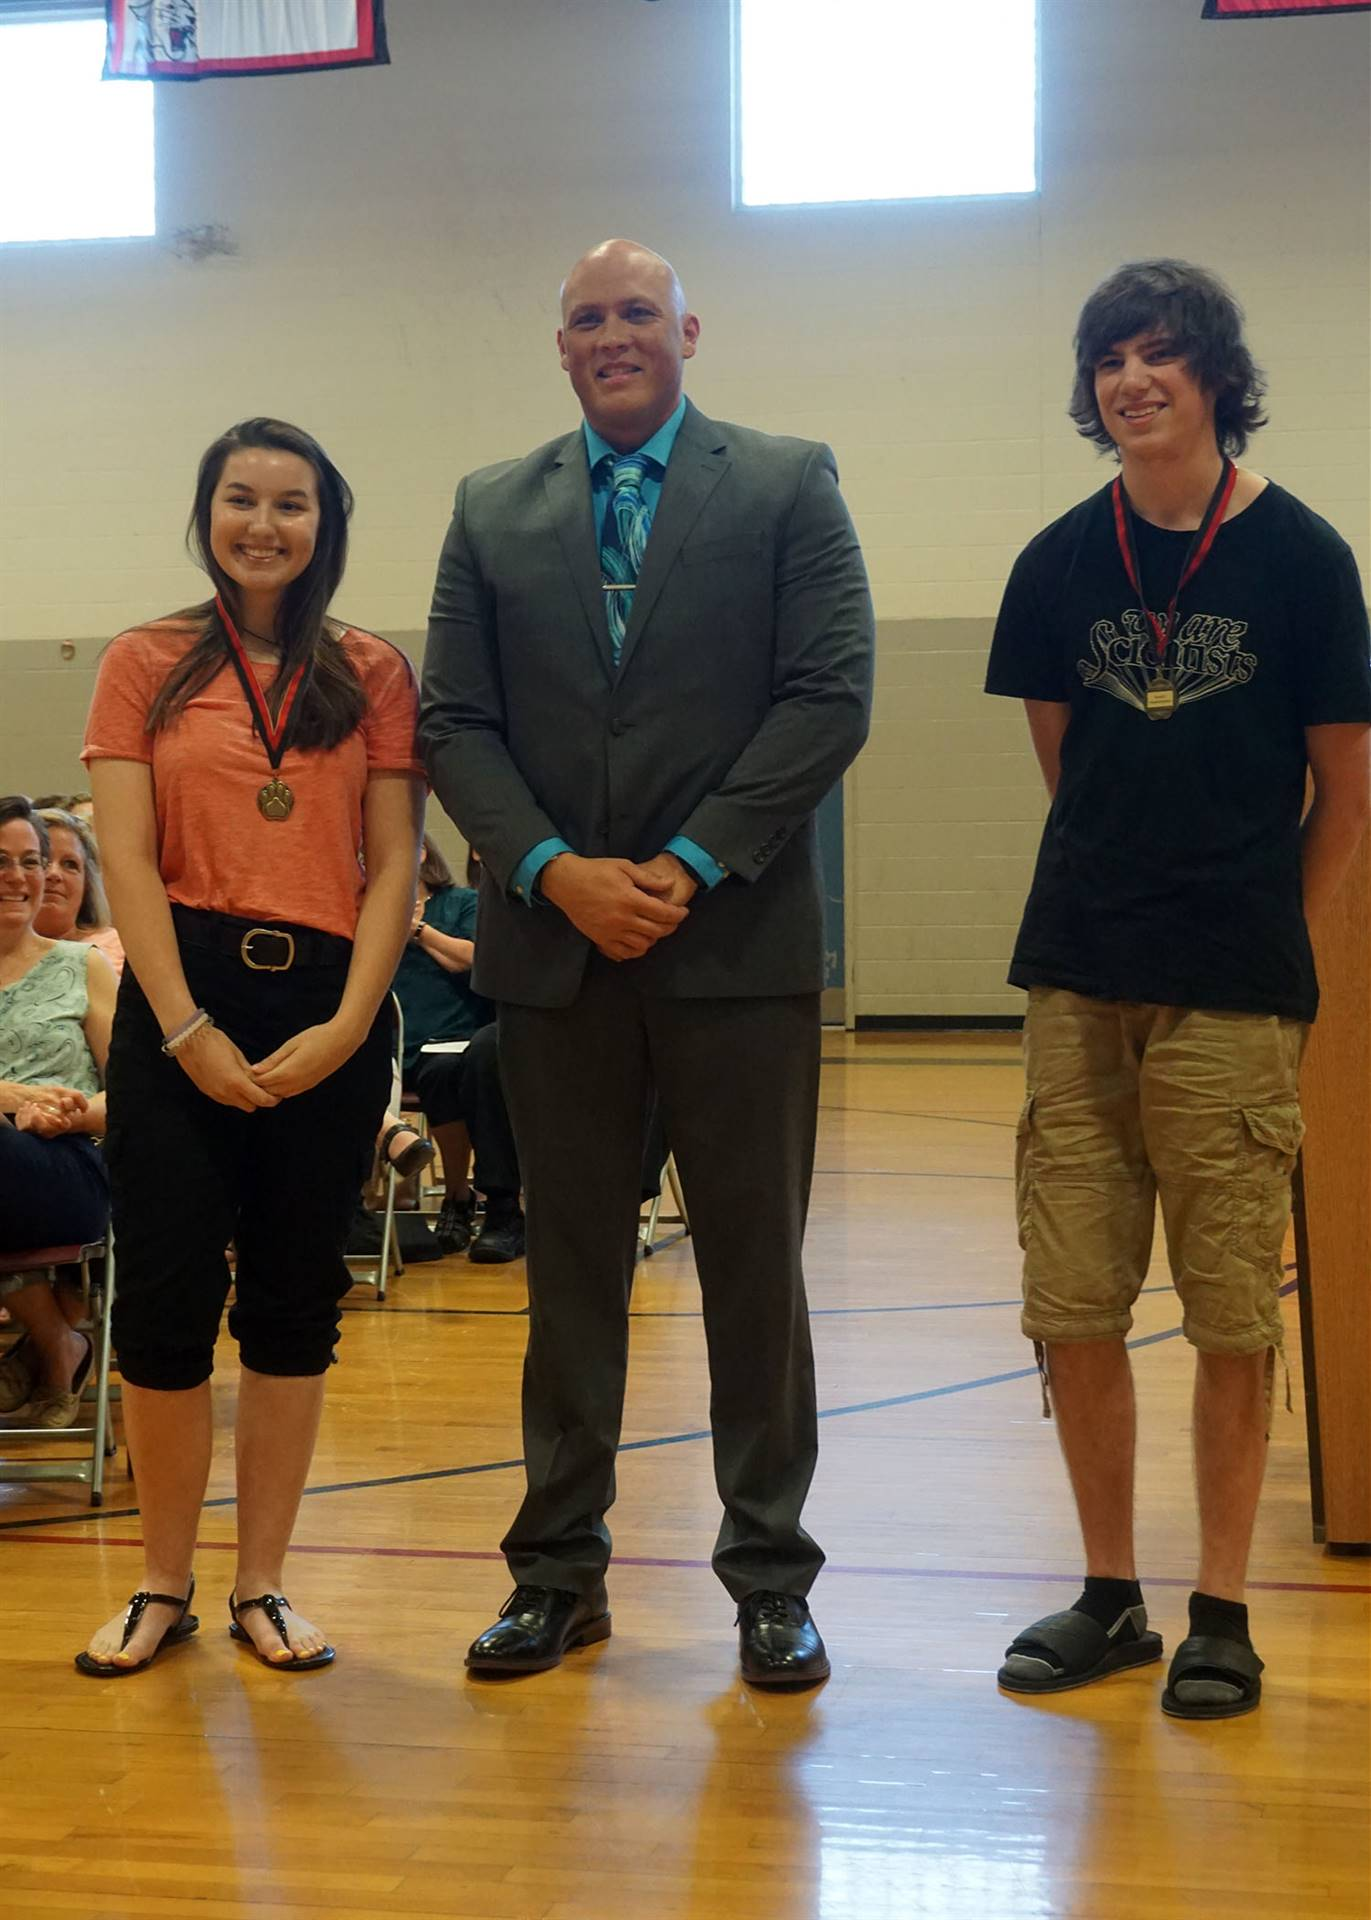 Respect award presented to Angela & Nick